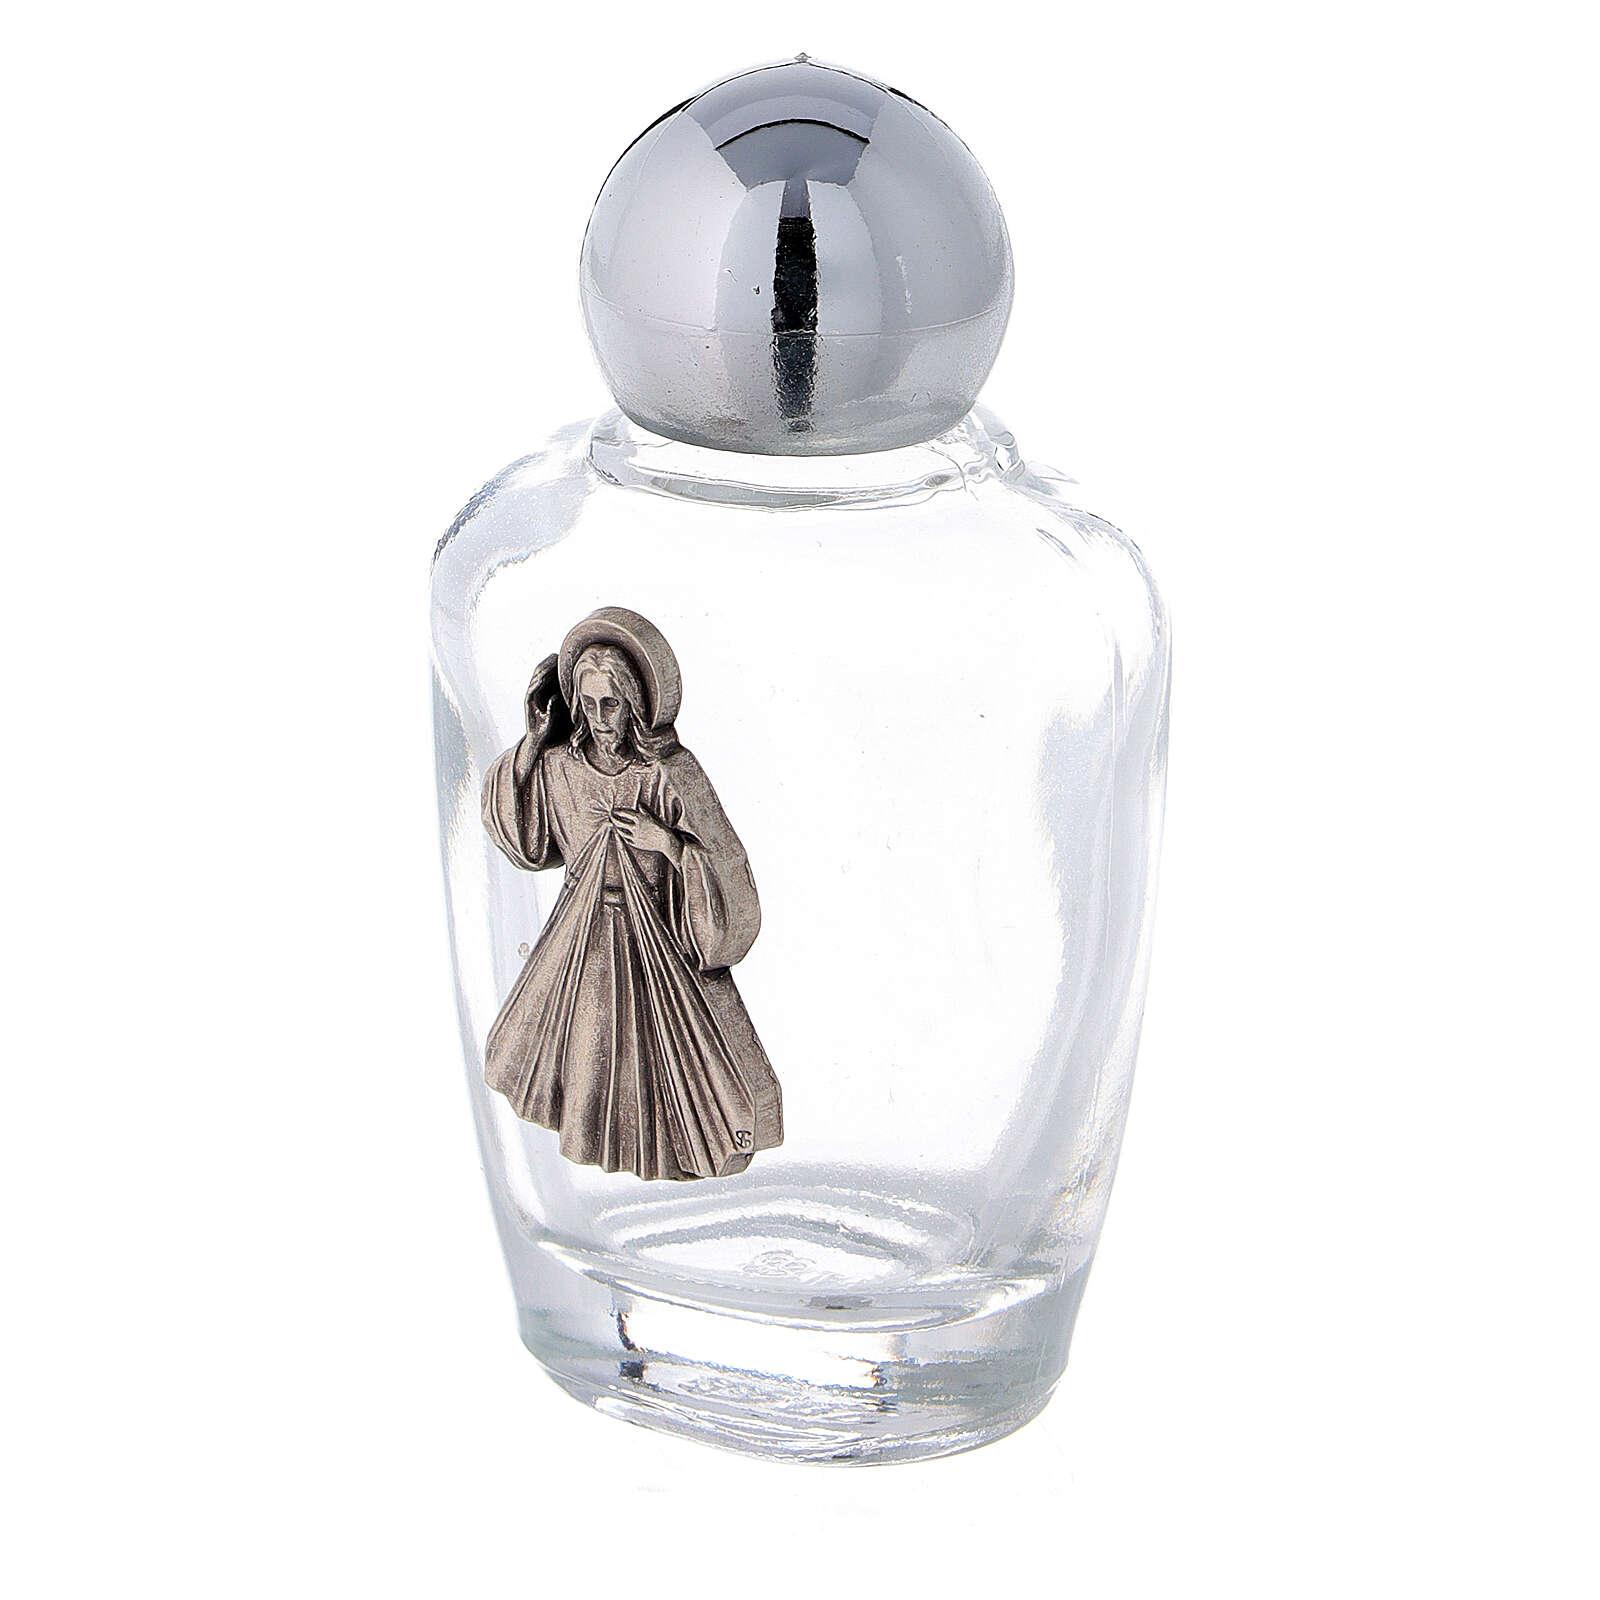 Botella agua bendita 15 ml Jesús placa metal (CAJA 50 PIEZAS) 3